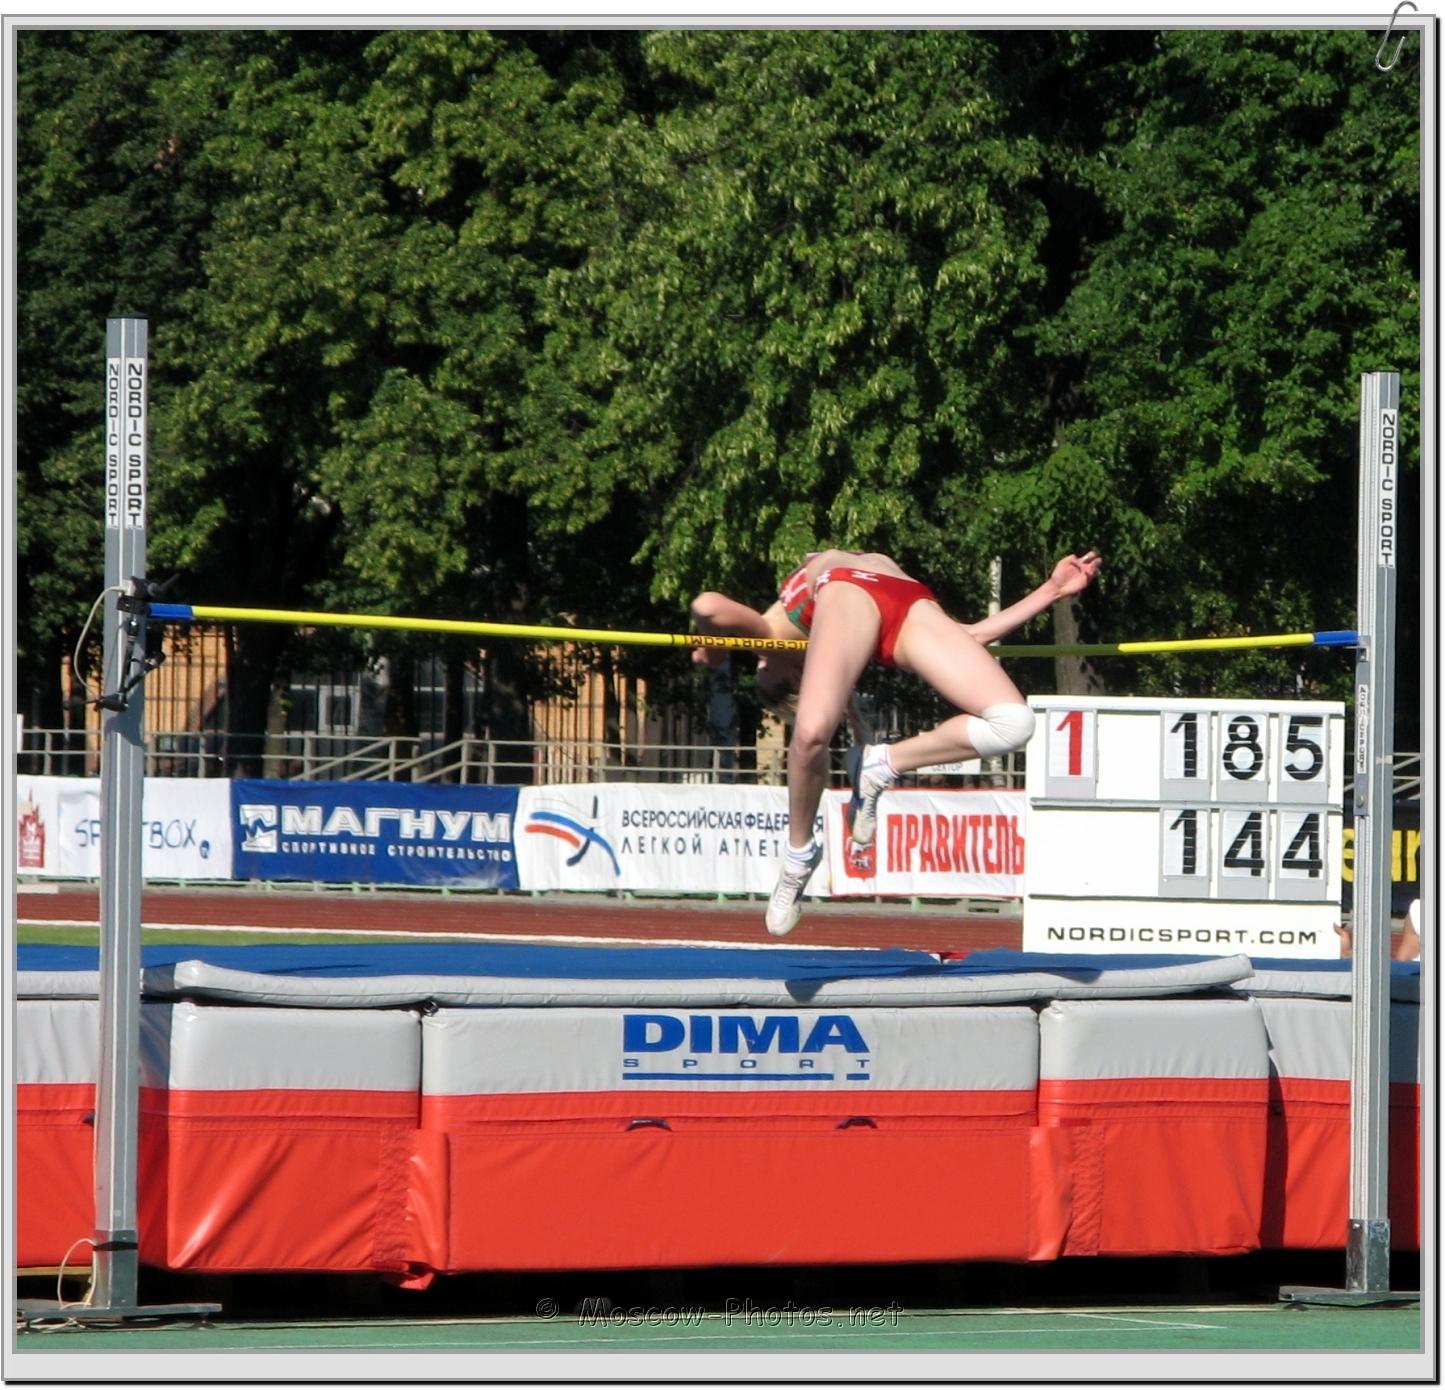 High Jump - Fosbury Flop